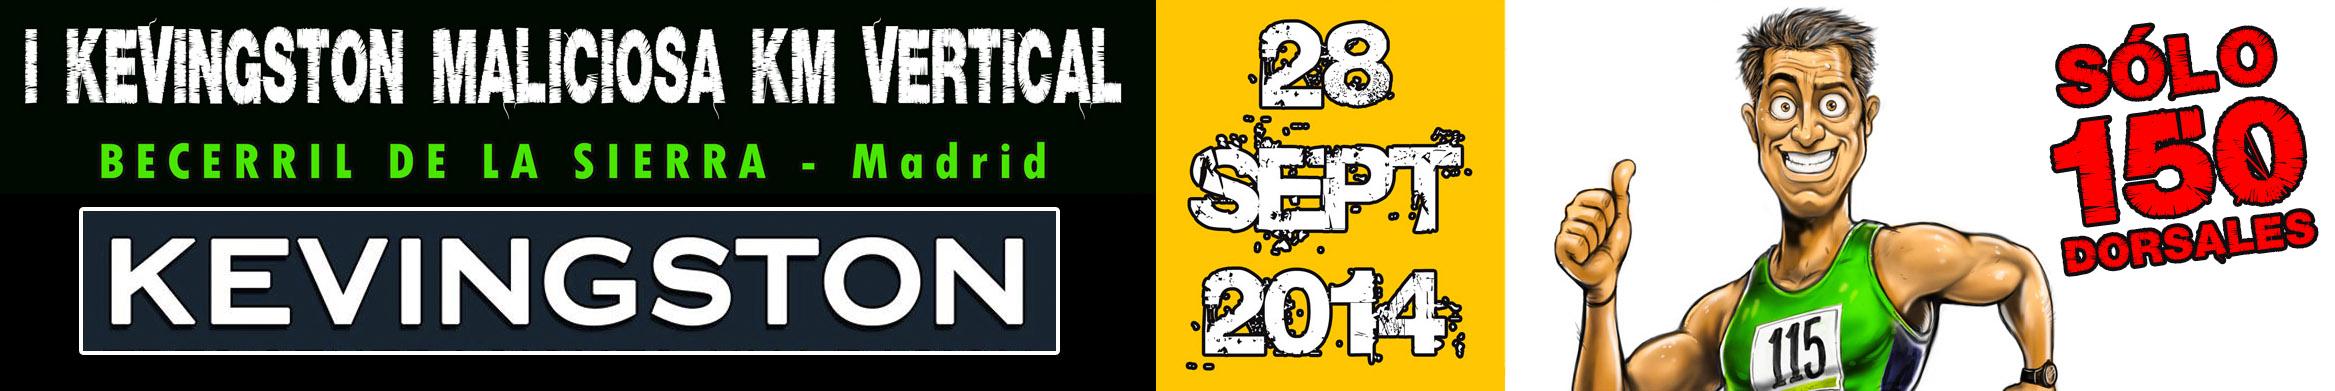 I KEVINGSTON MALICIOSA KM VERTICAL- 28 Septiembre 2014 by TODOVERTICAL